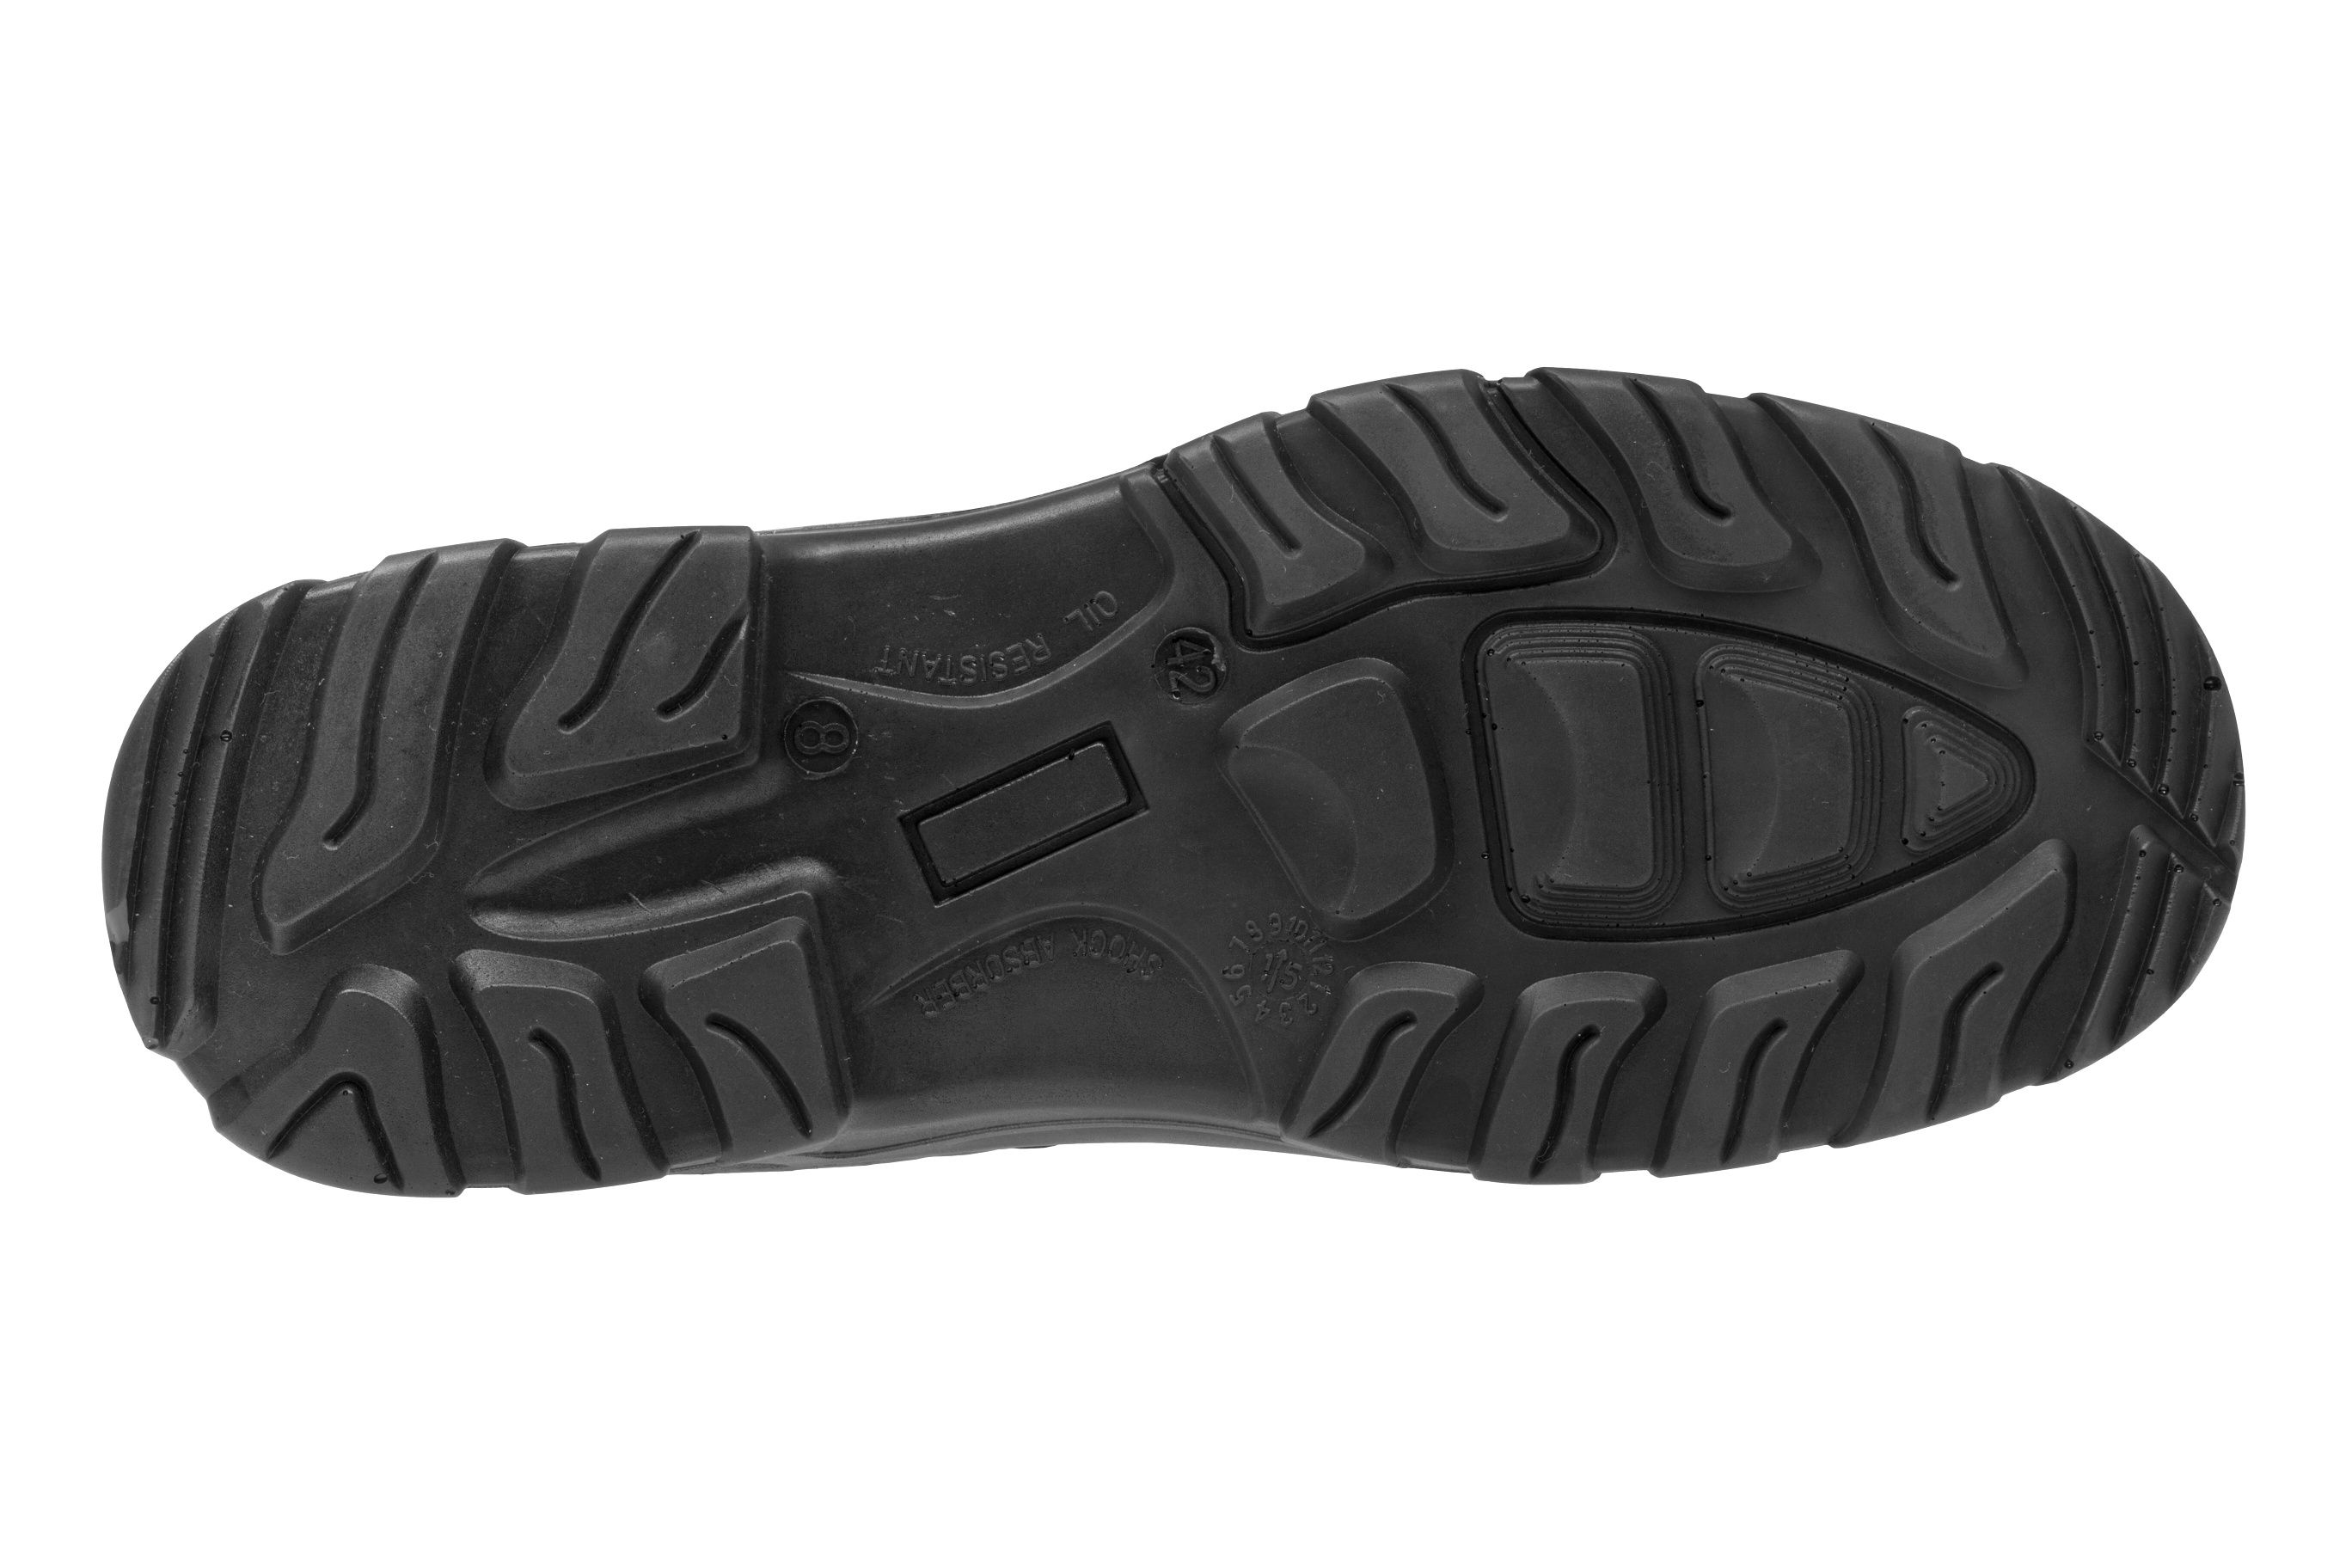 Rapido OB Black   shoe sole   Pinterest 59ca6159b6